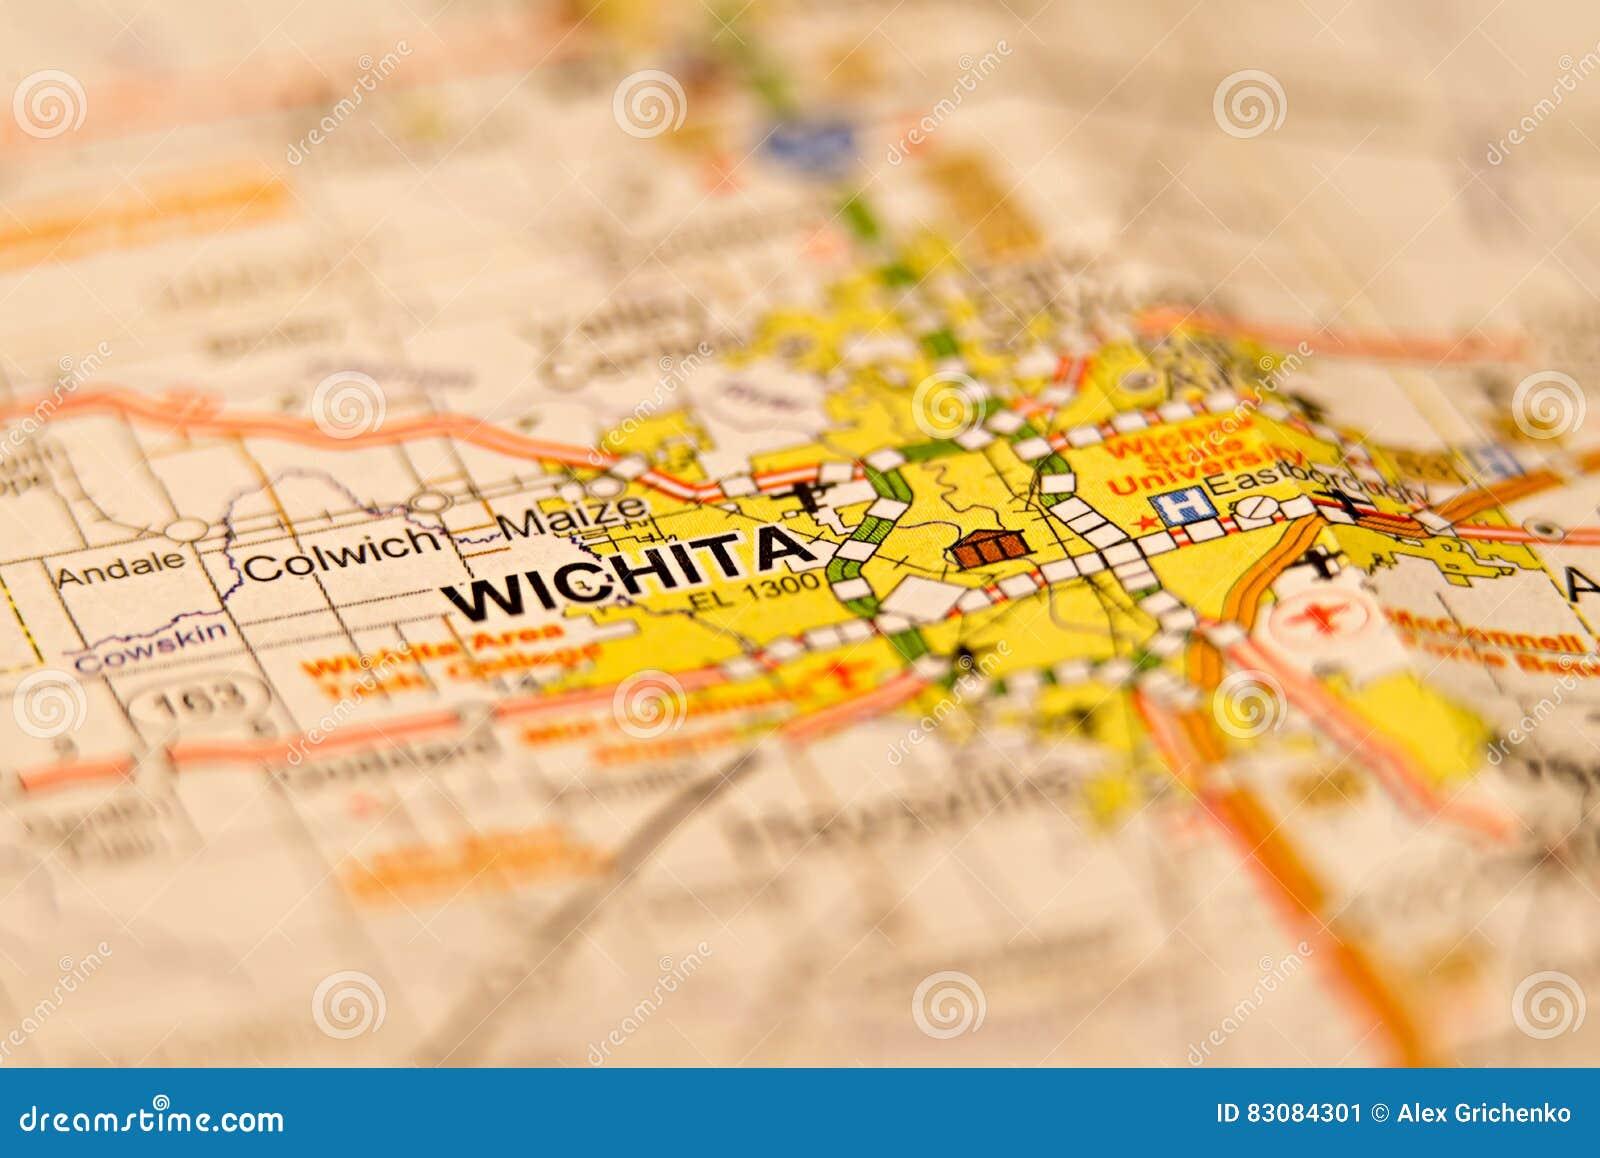 Wichita Kansas City Area Map Stock Image Image Of States